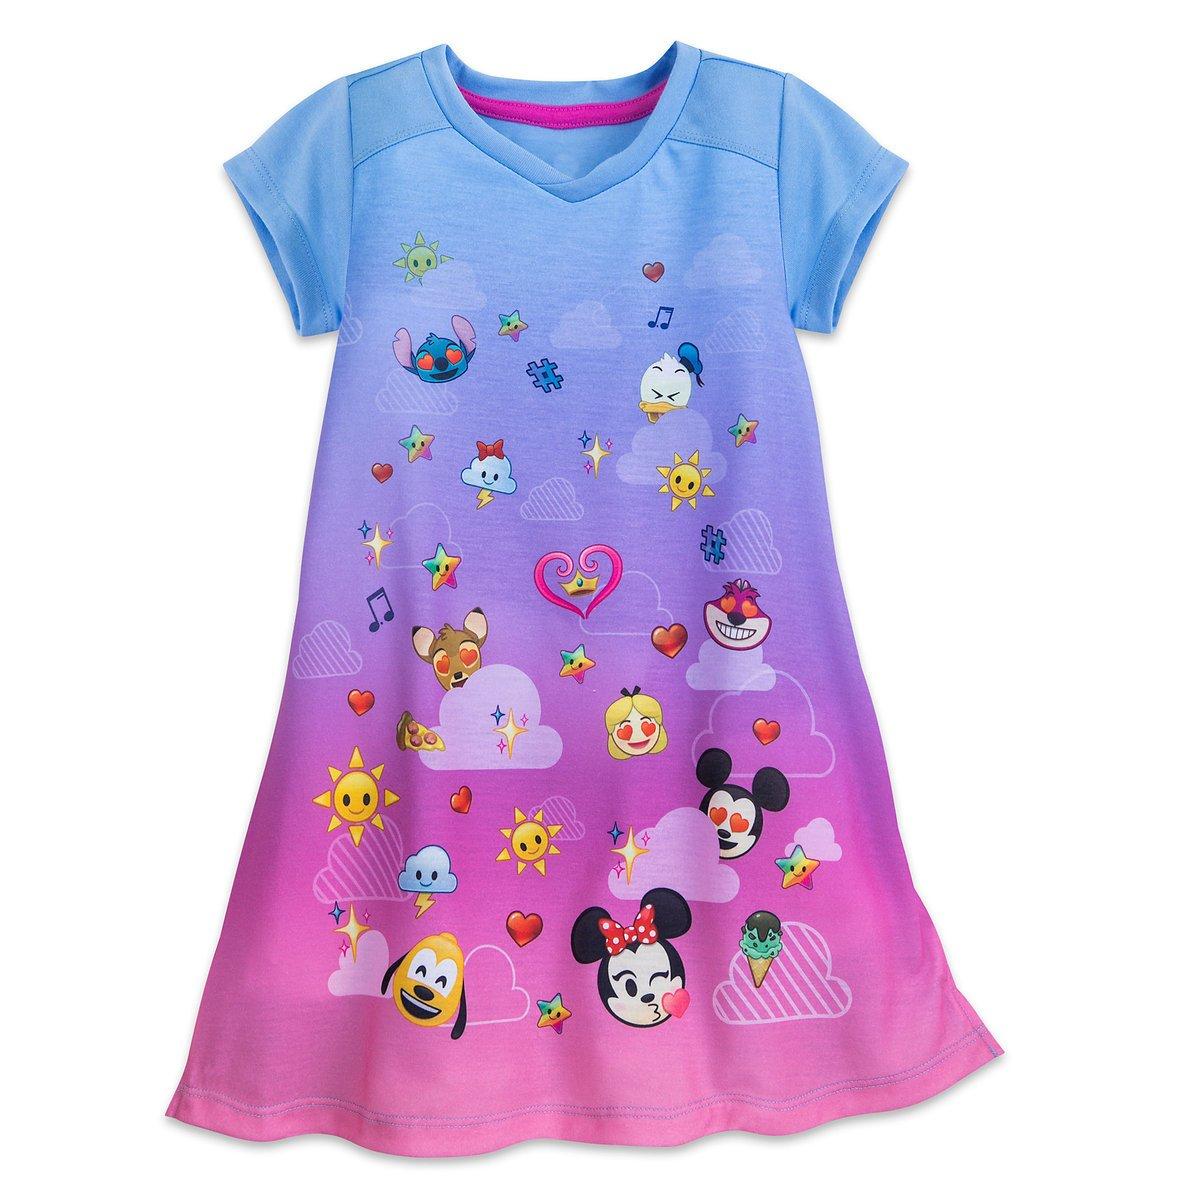 Disney Emoji Nightshirt For Girls 4902055252239900